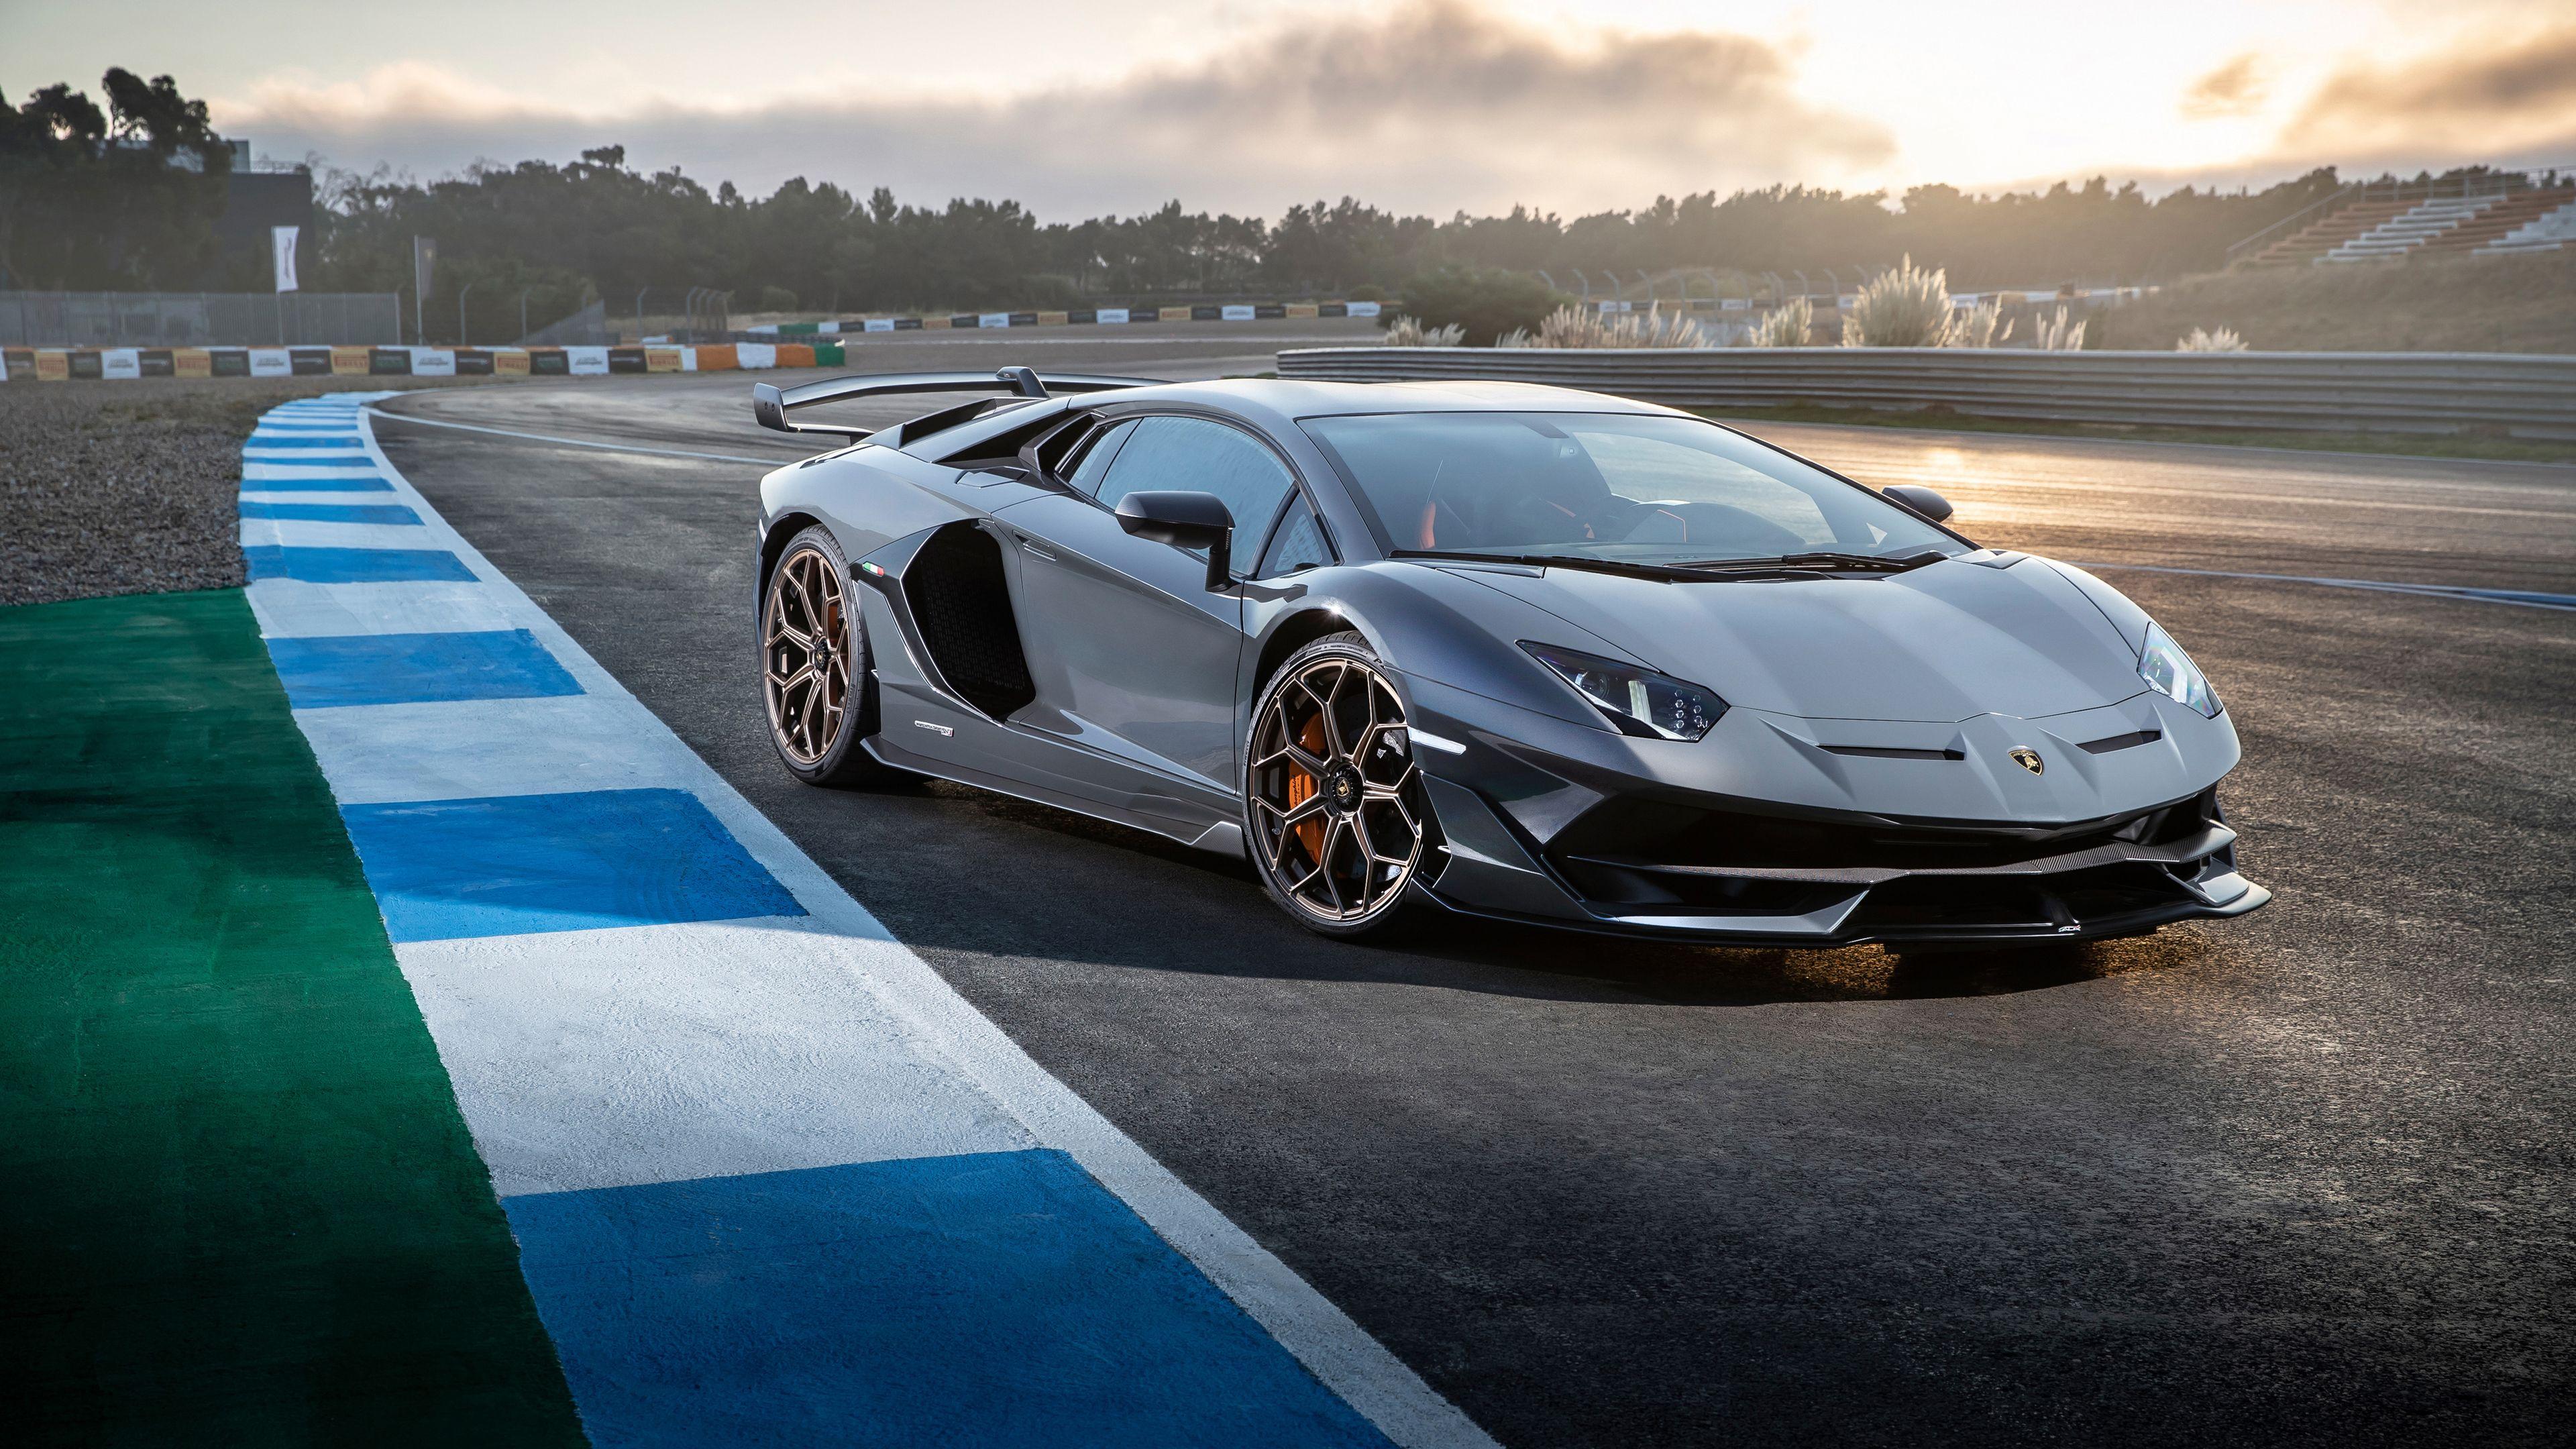 Wallpaper 4k Lamborghini Aventador Svj 2019 4k 2018 Cars